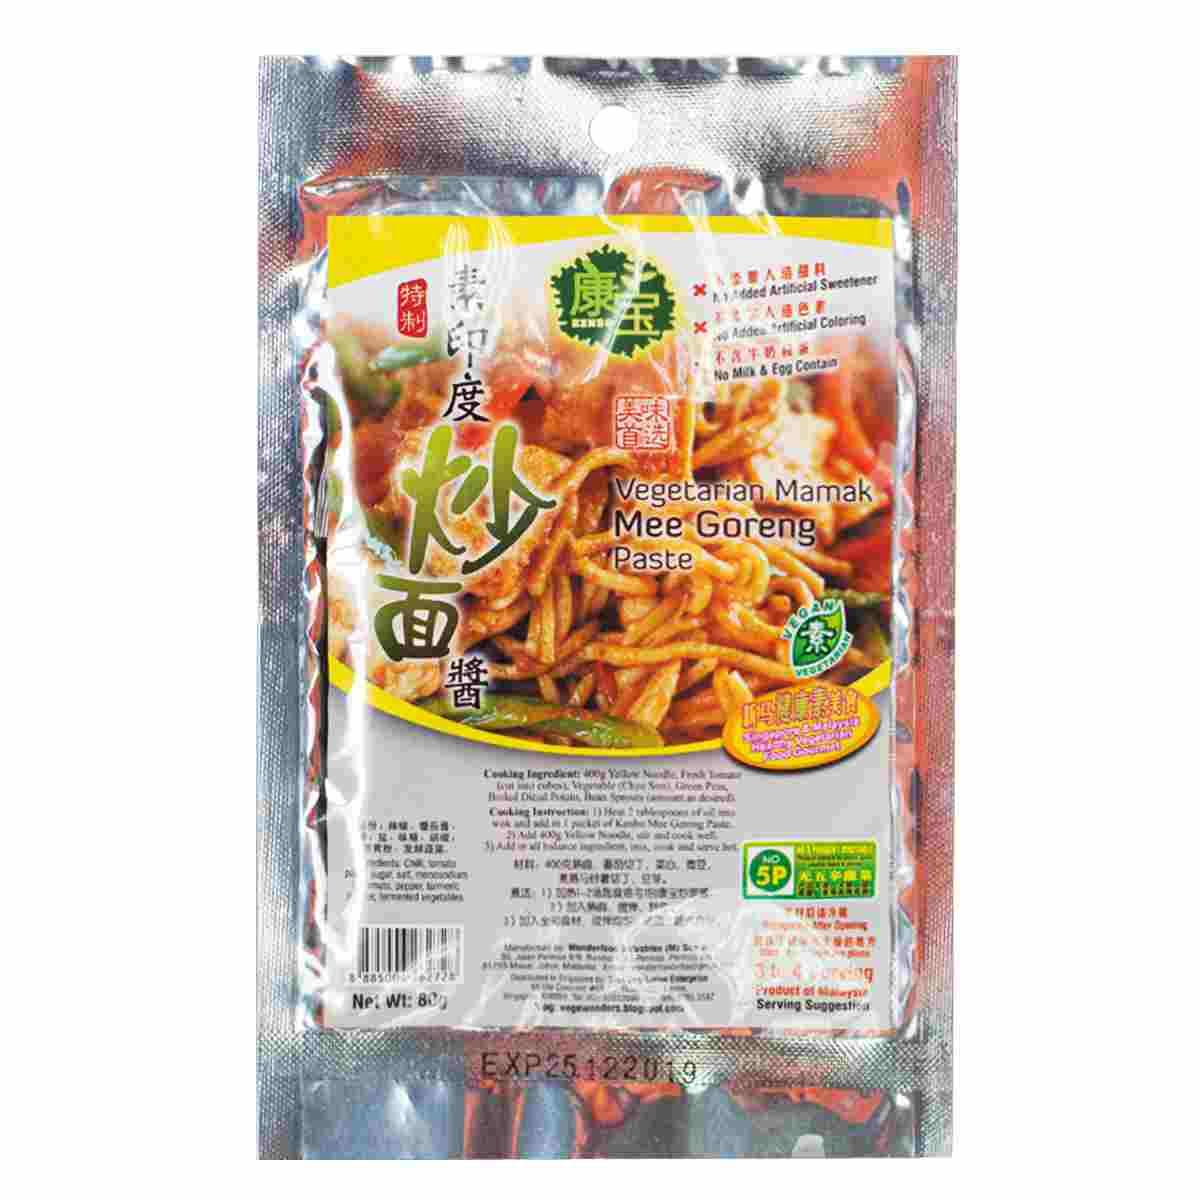 Image Mamak Mee Goreng Paste 康宝 - 印度炒面酱 80grams